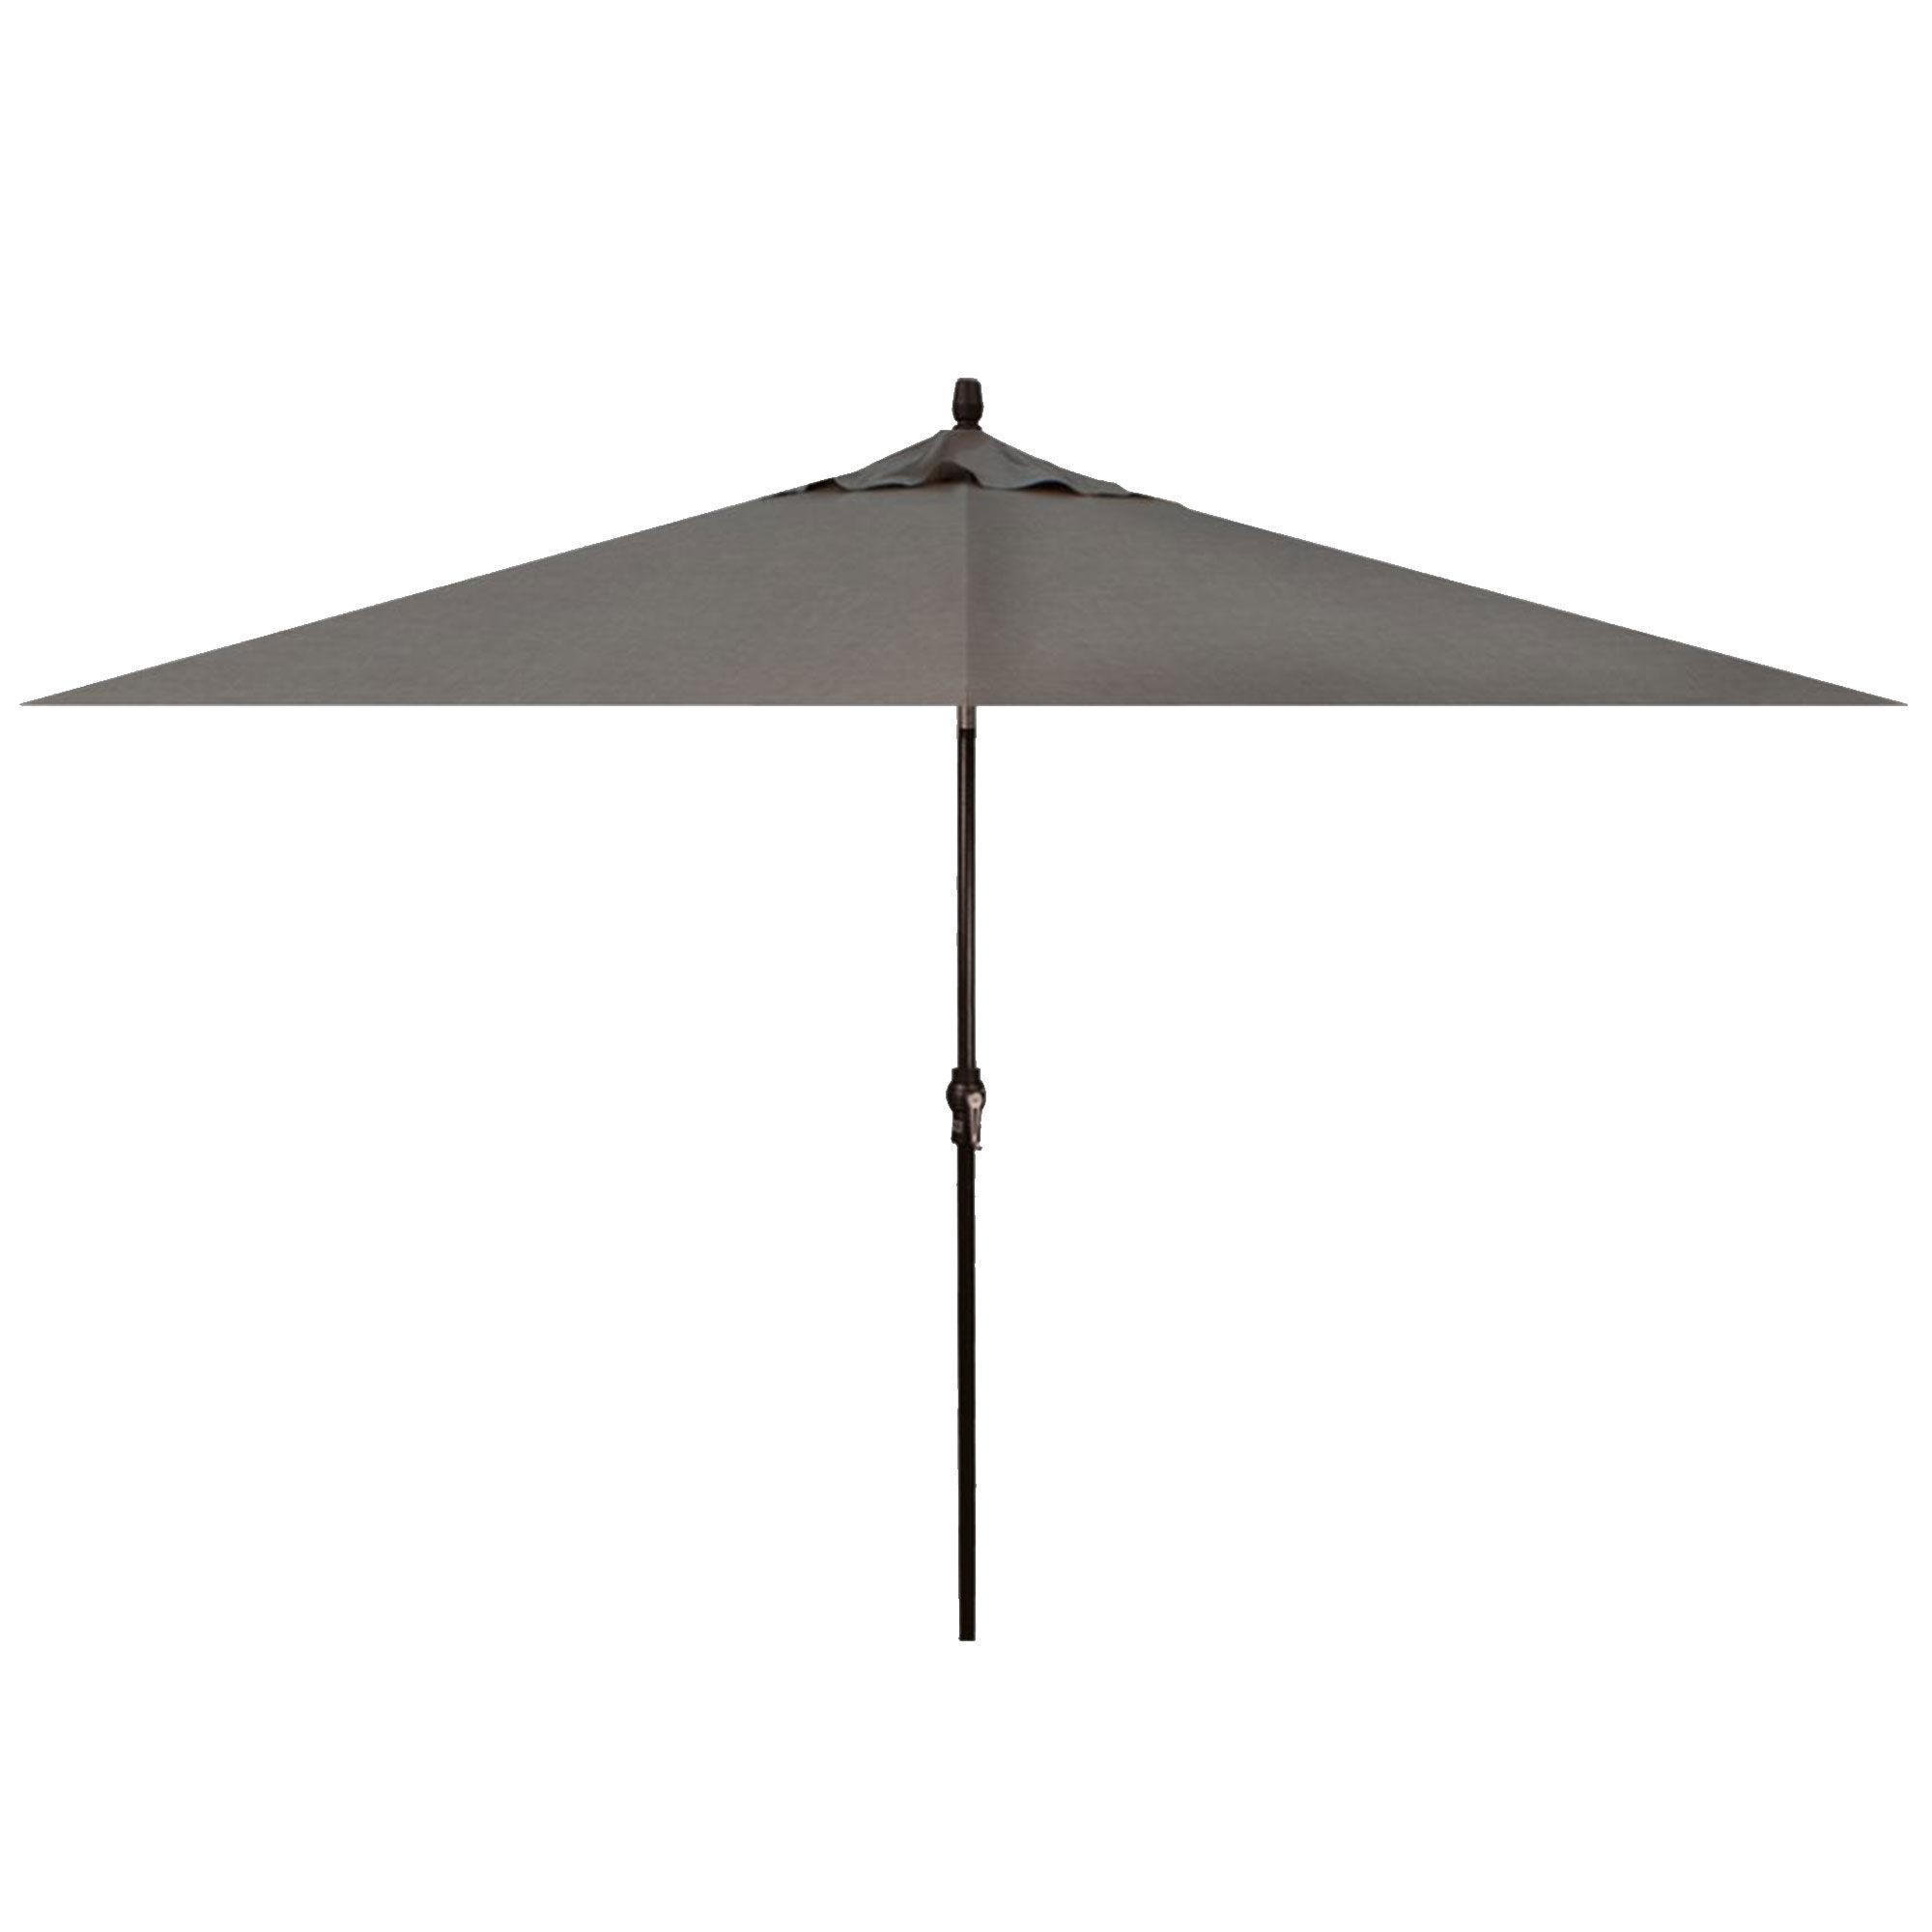 Treasure Garden 8x10' Auto Tilt Cast Slate Rectangle Umbrella  - Black/Cast Slate - Size: One Size